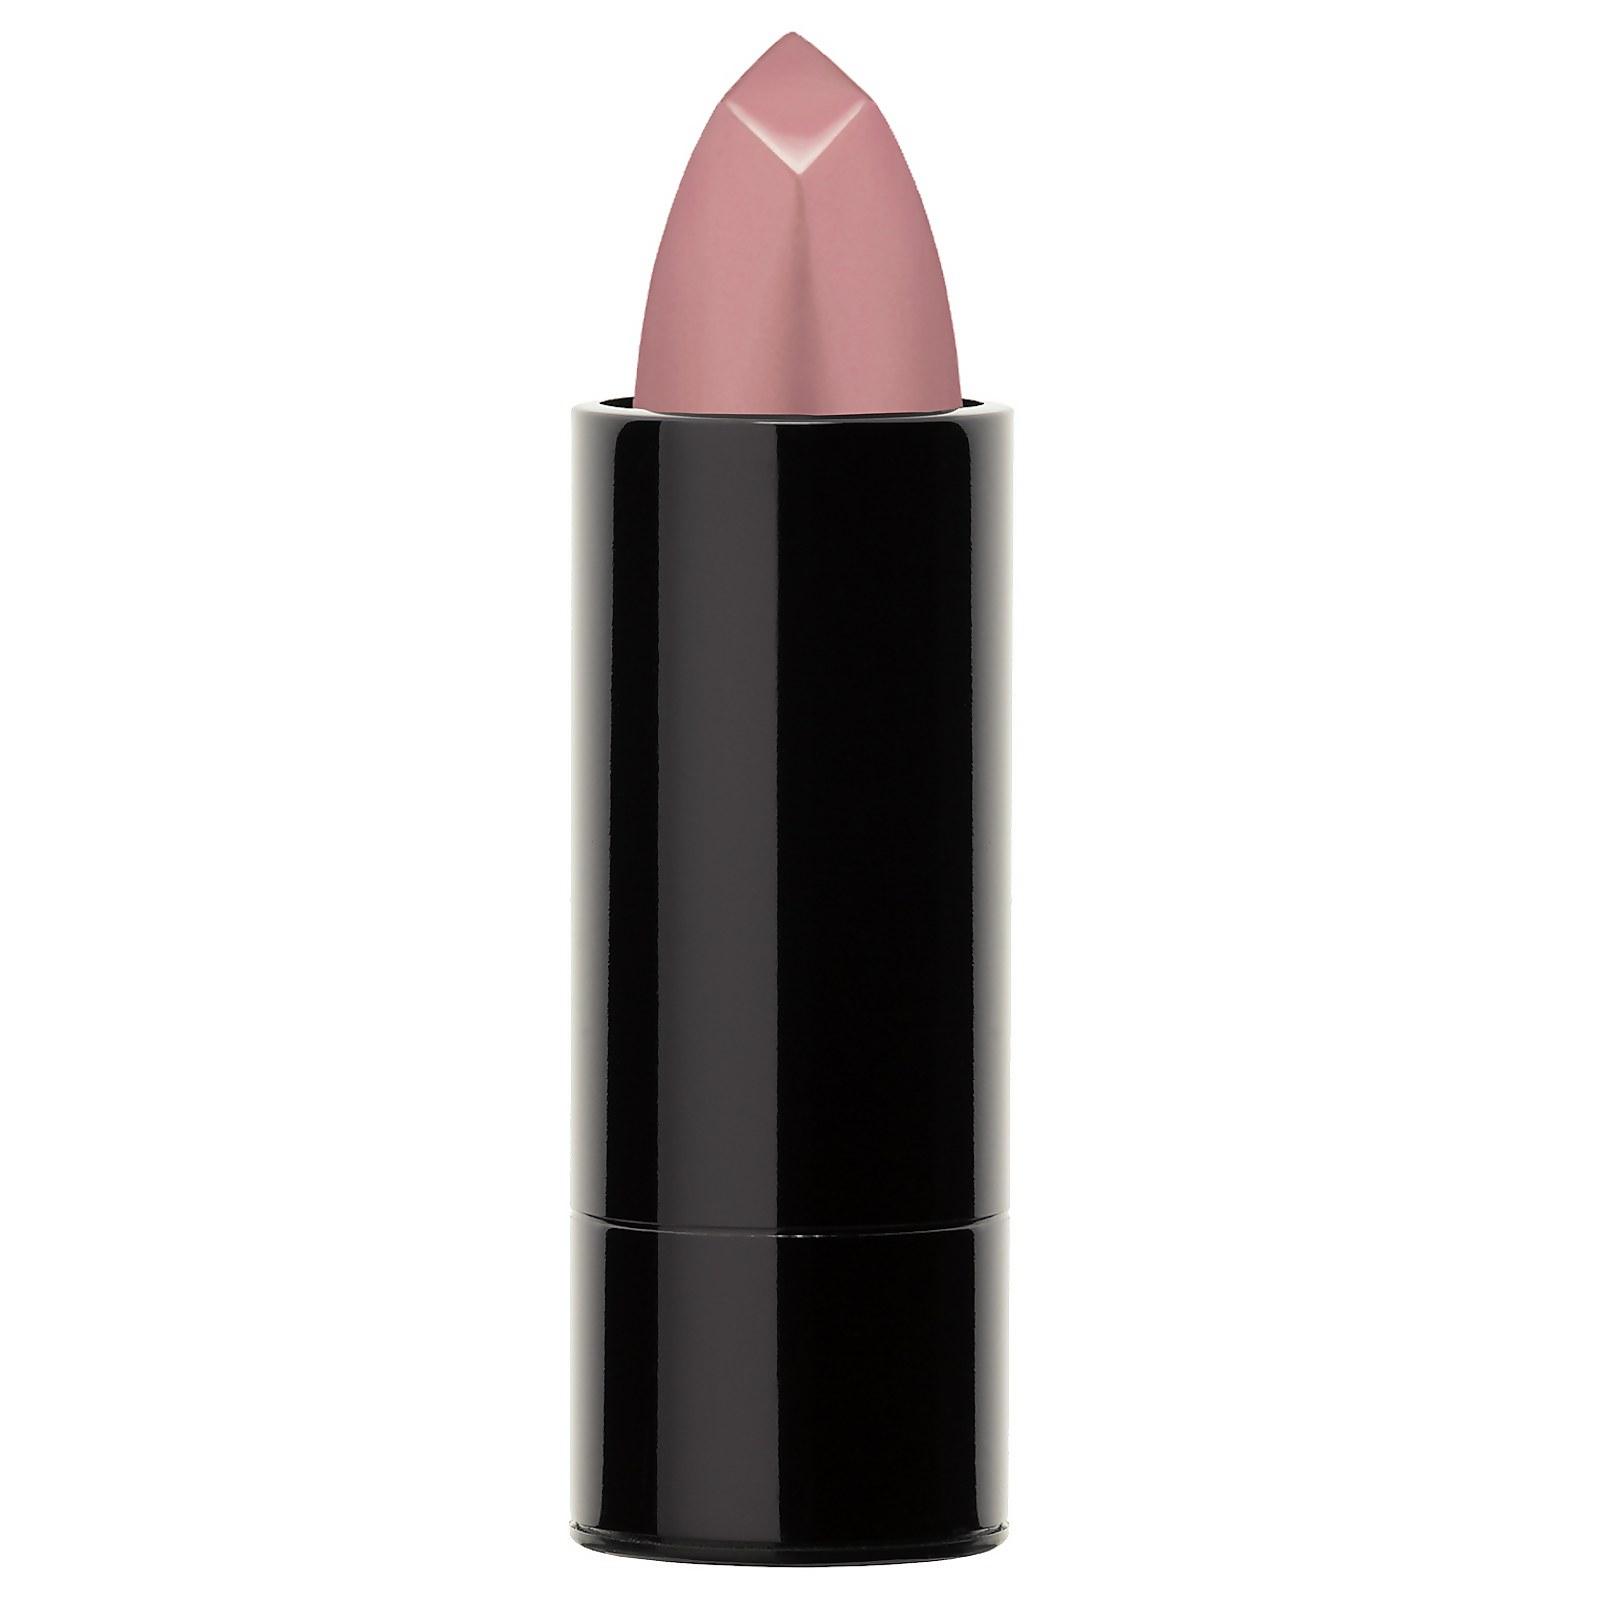 Serge Lutens Lipstick Fard à Lèvres Refill 2.3g (Various Shades) - N°26 Mauve de Swann